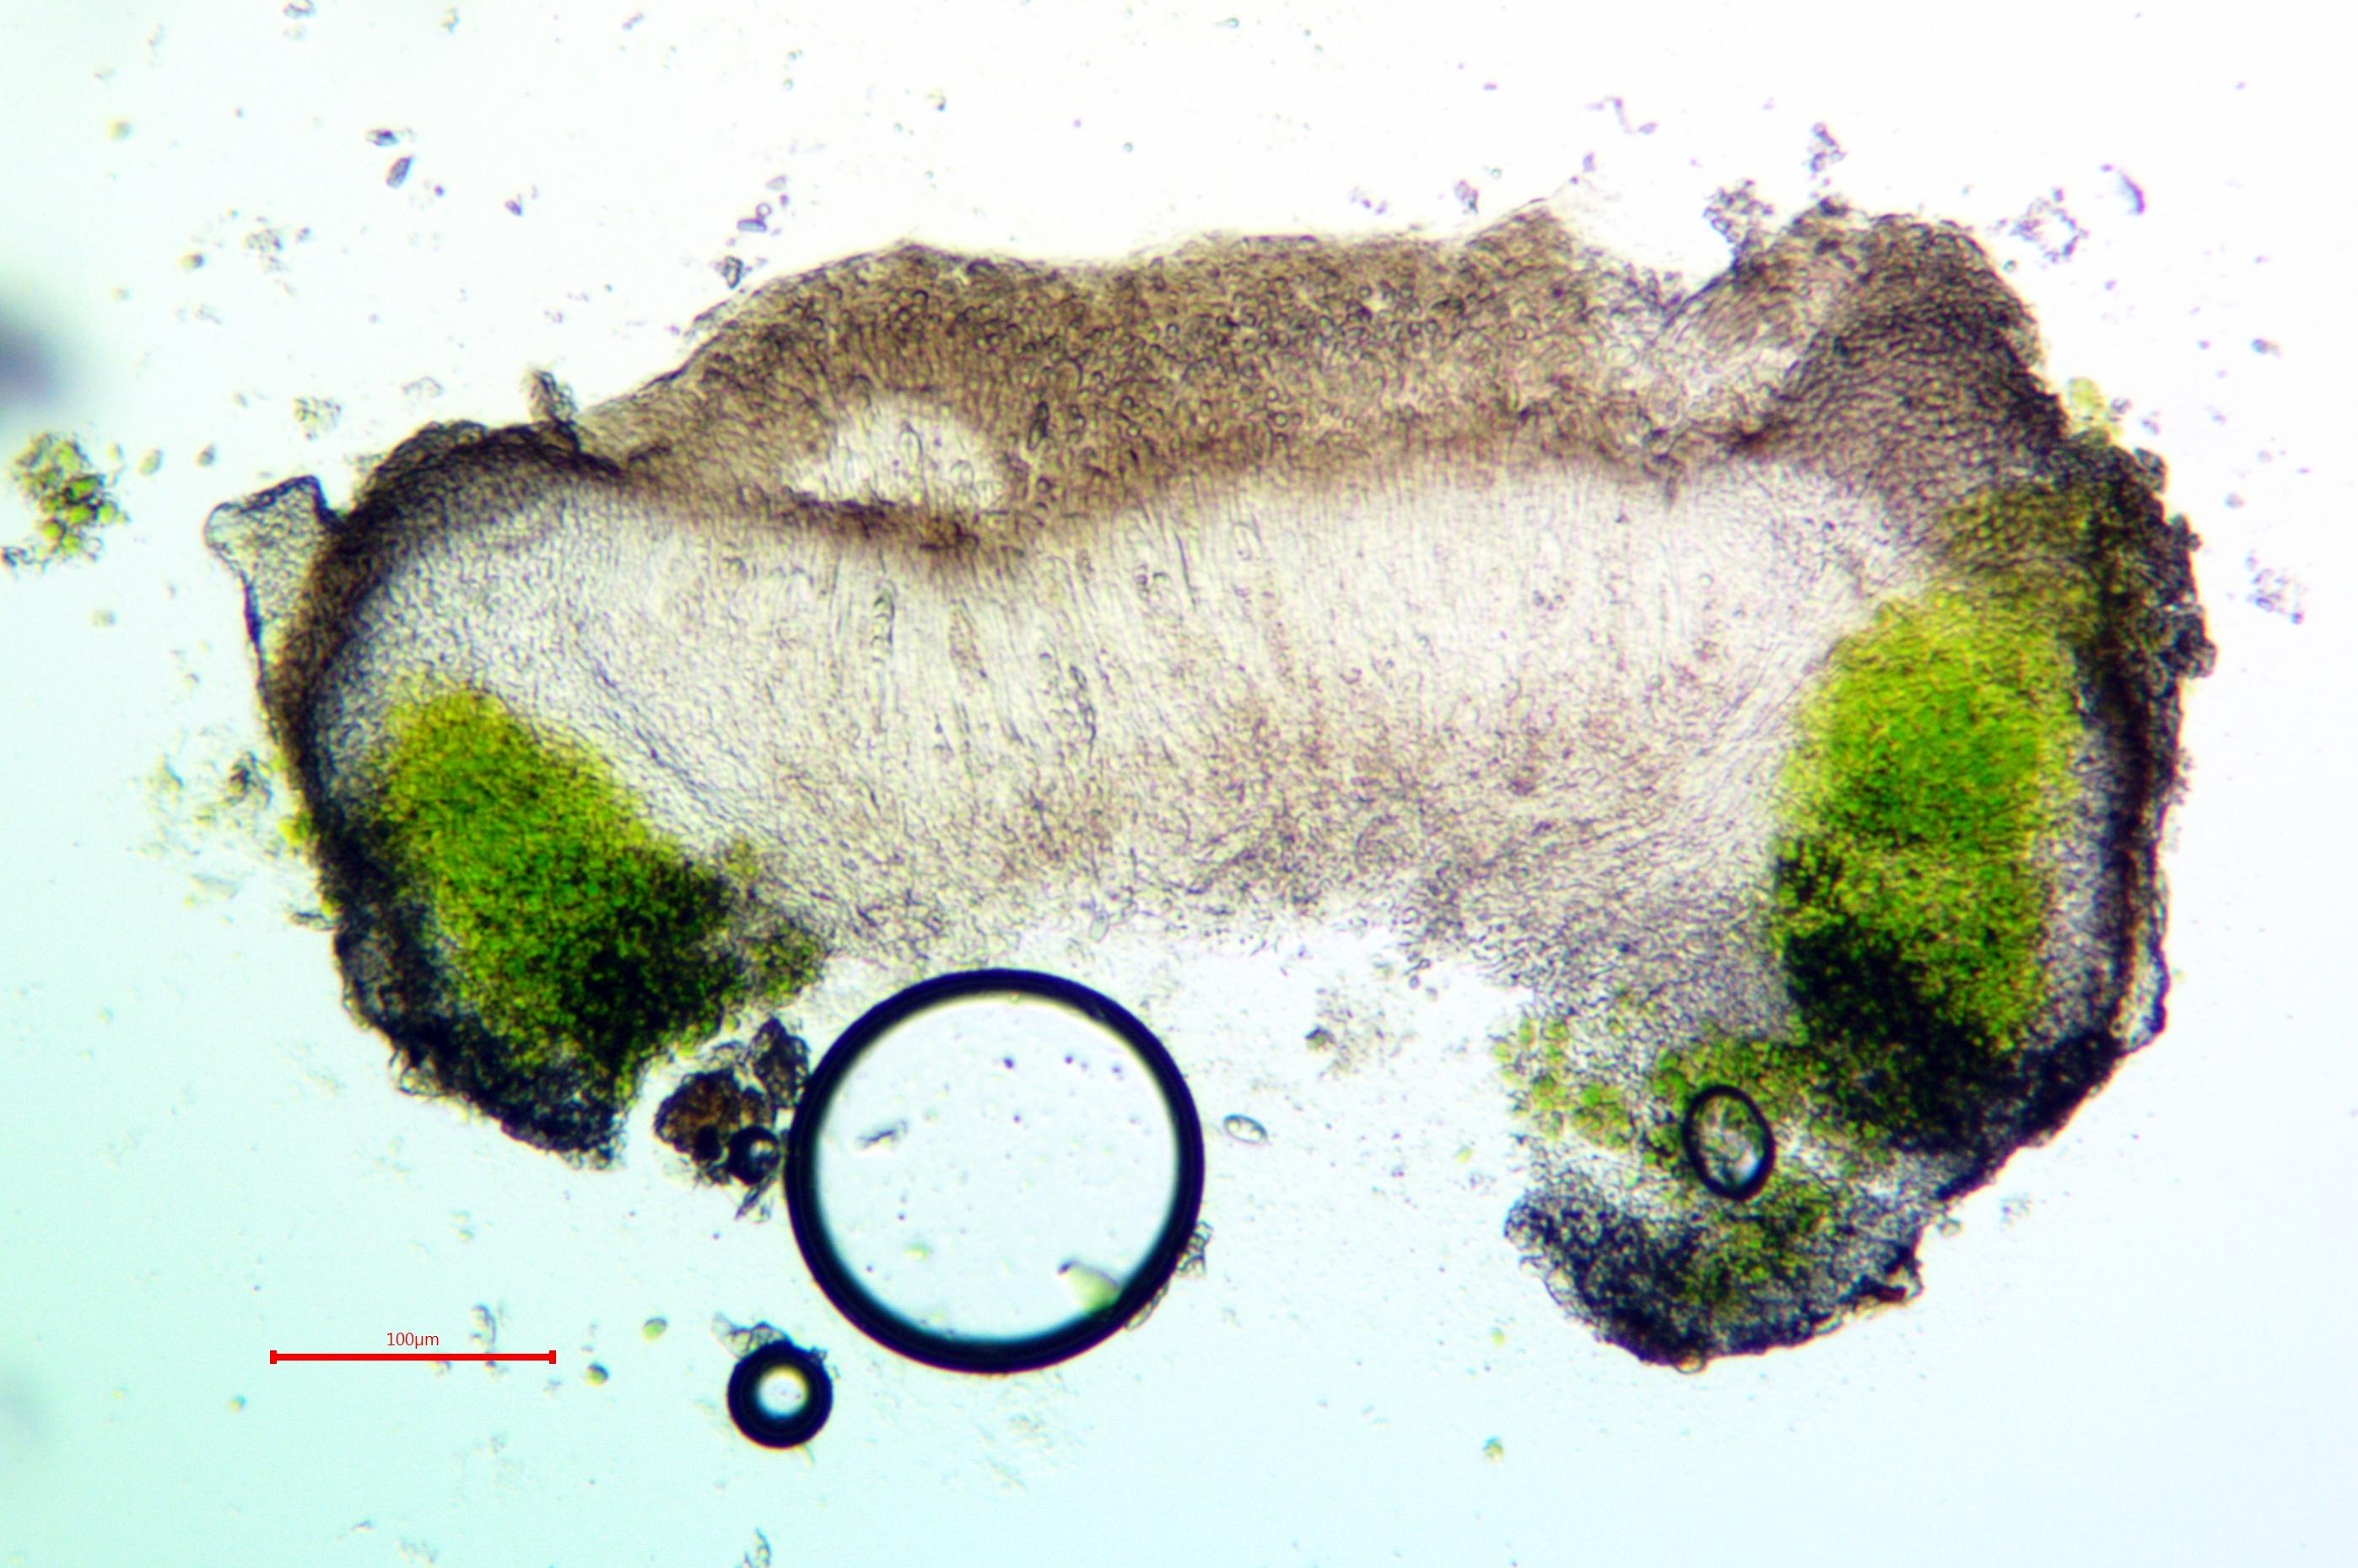 Caloplaca albovariegata image